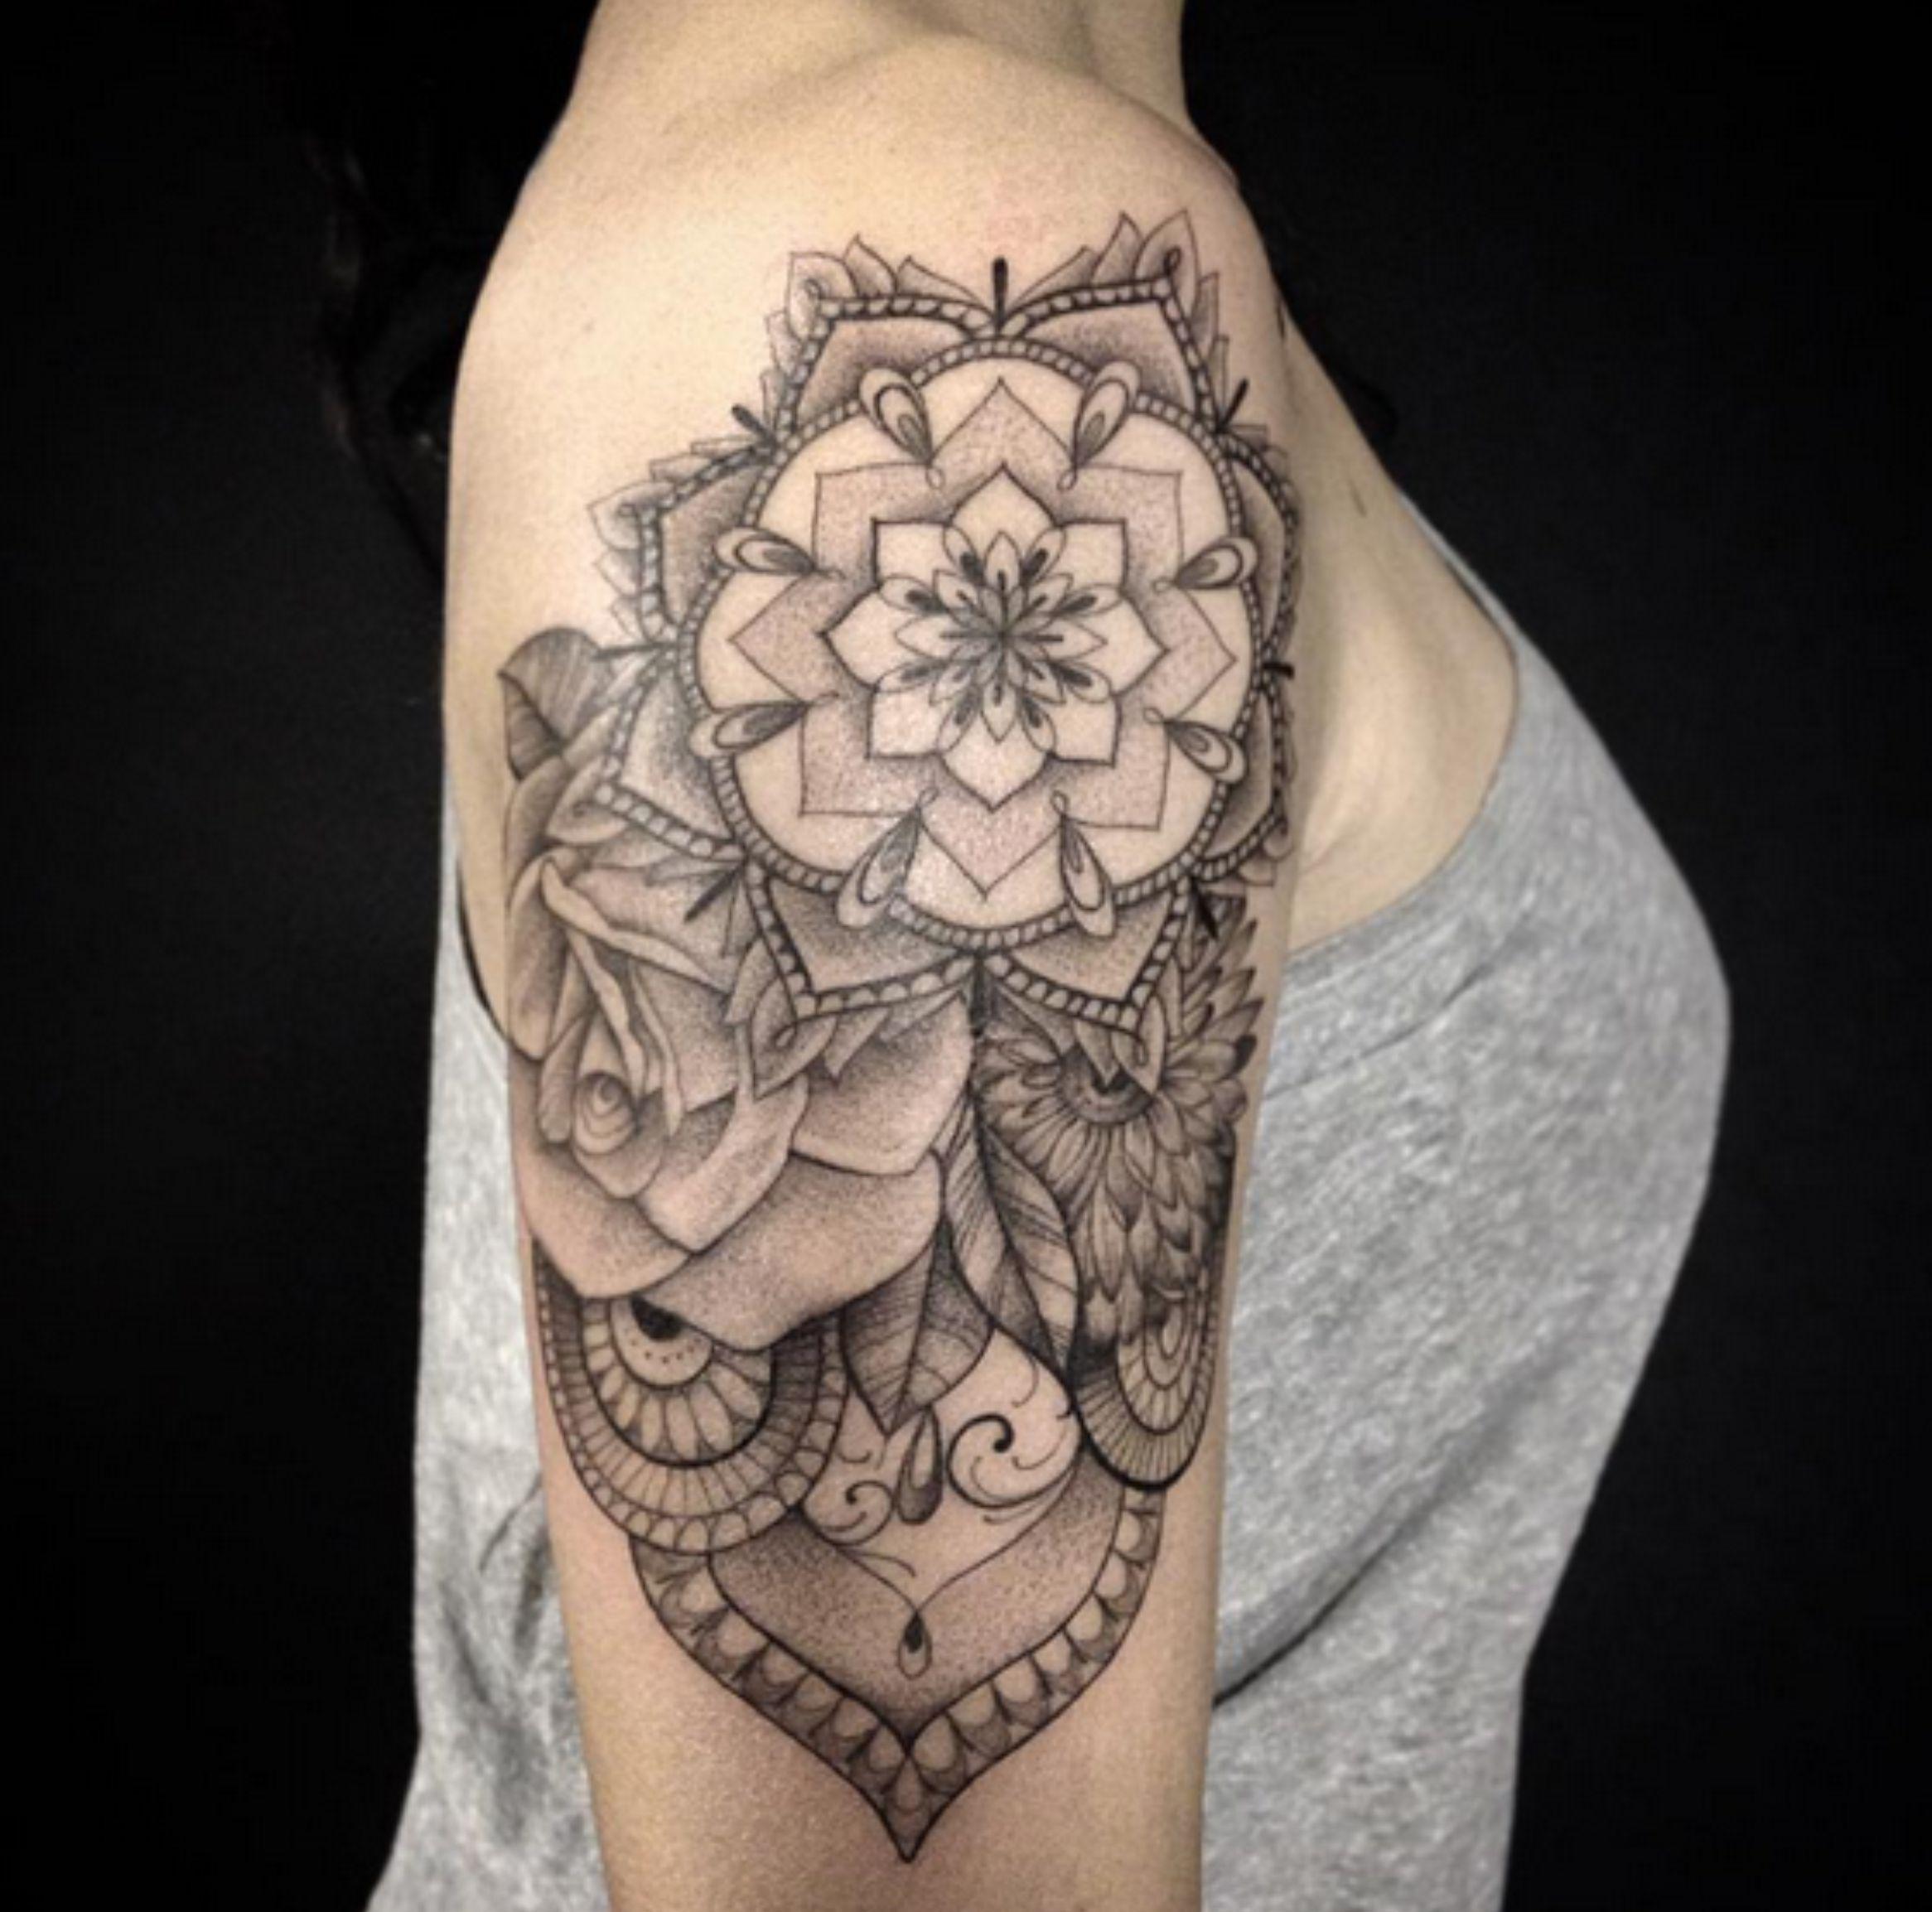 tattoo ombro feminina Pesquisa Google Tattoo ombros